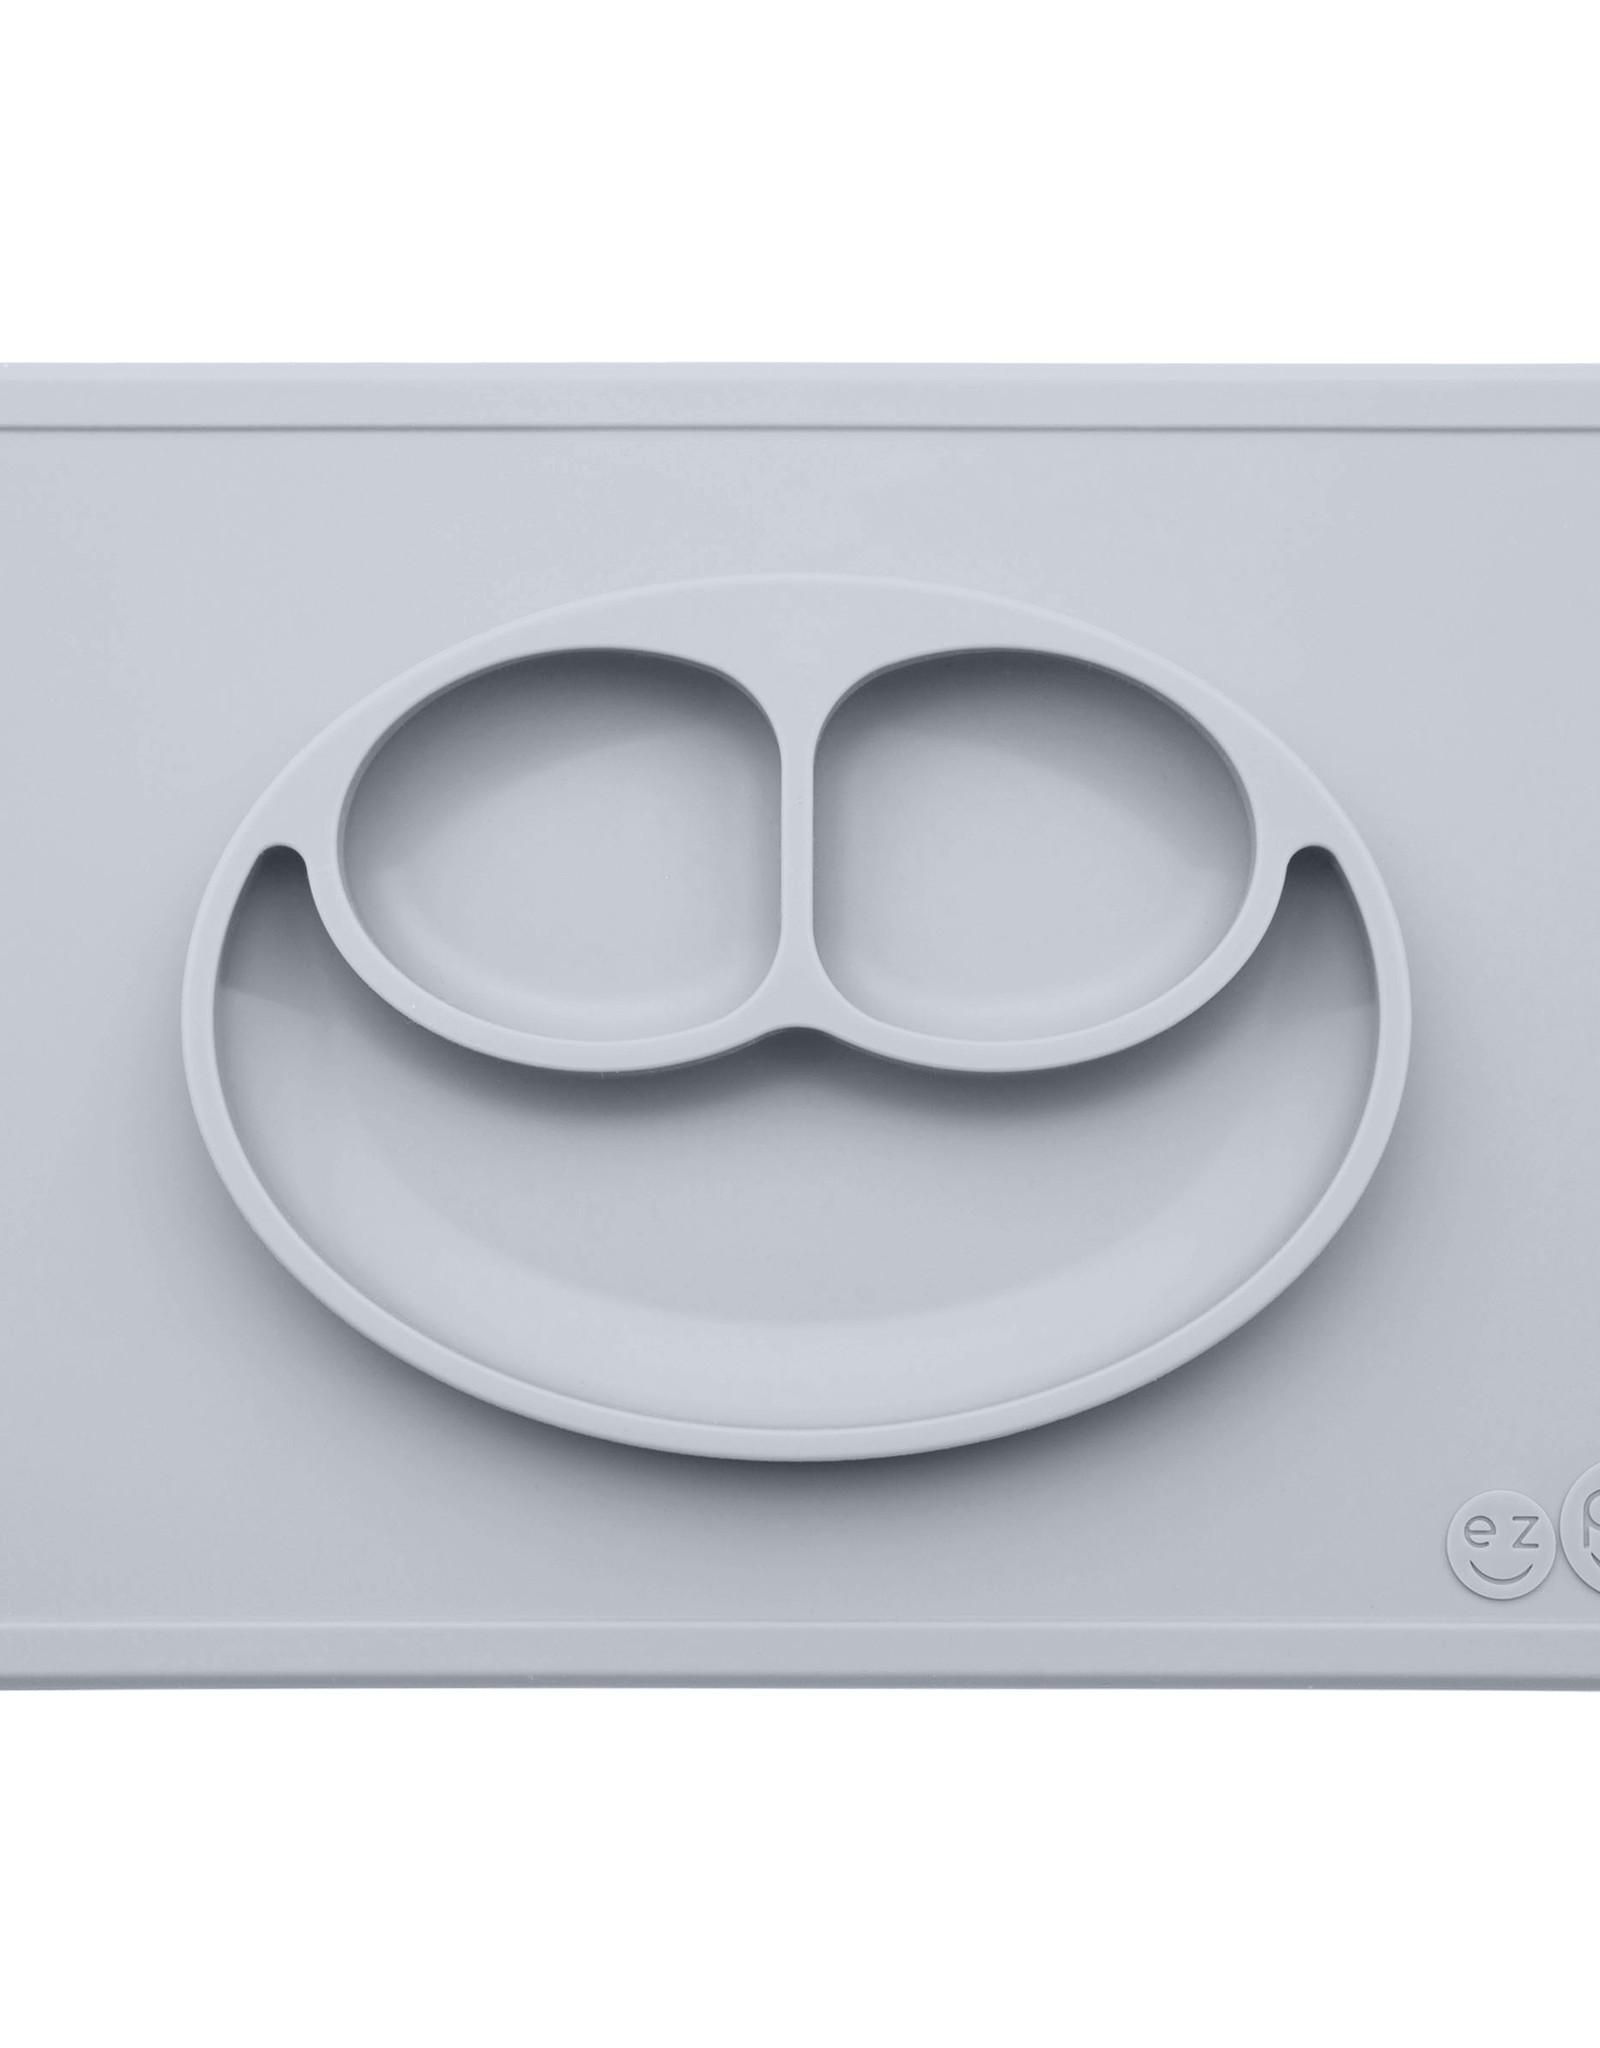 EZPZ Happy mat - Pewter